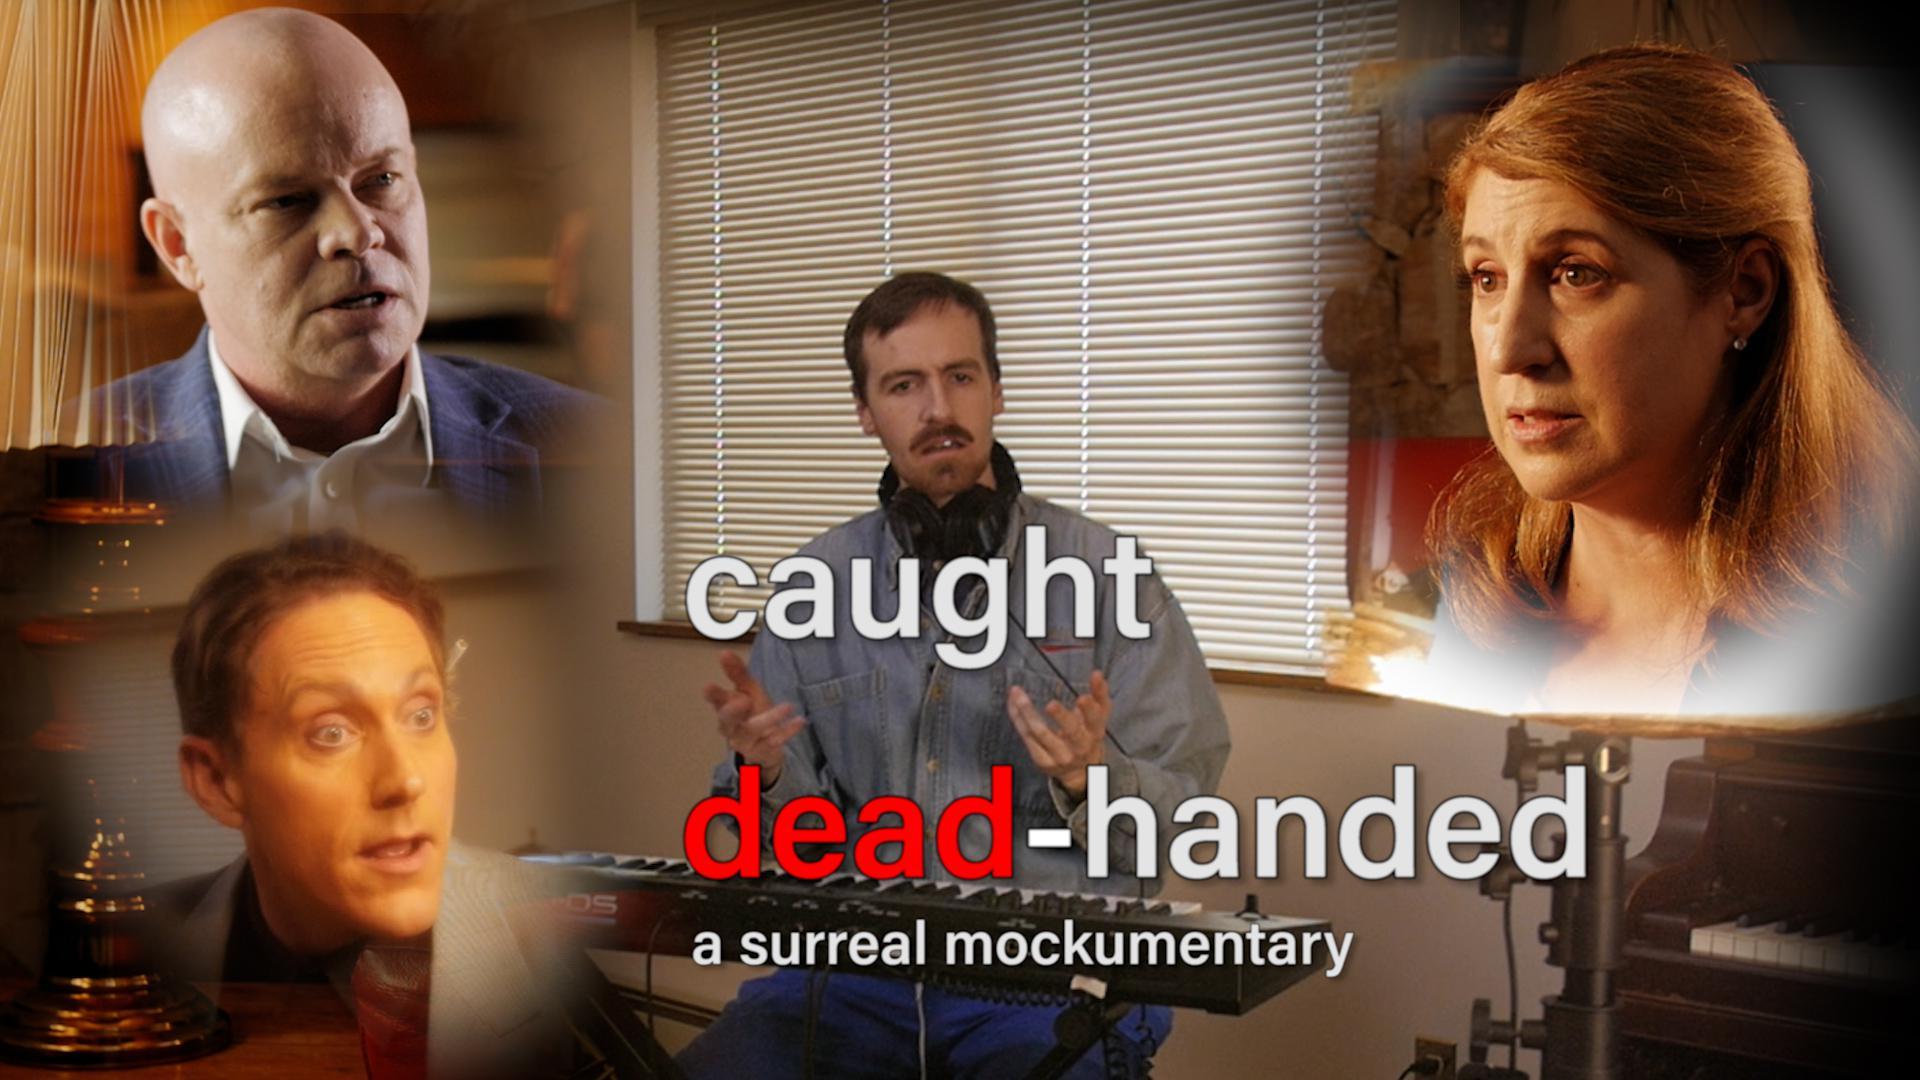 Caught Dead-Handed Redux